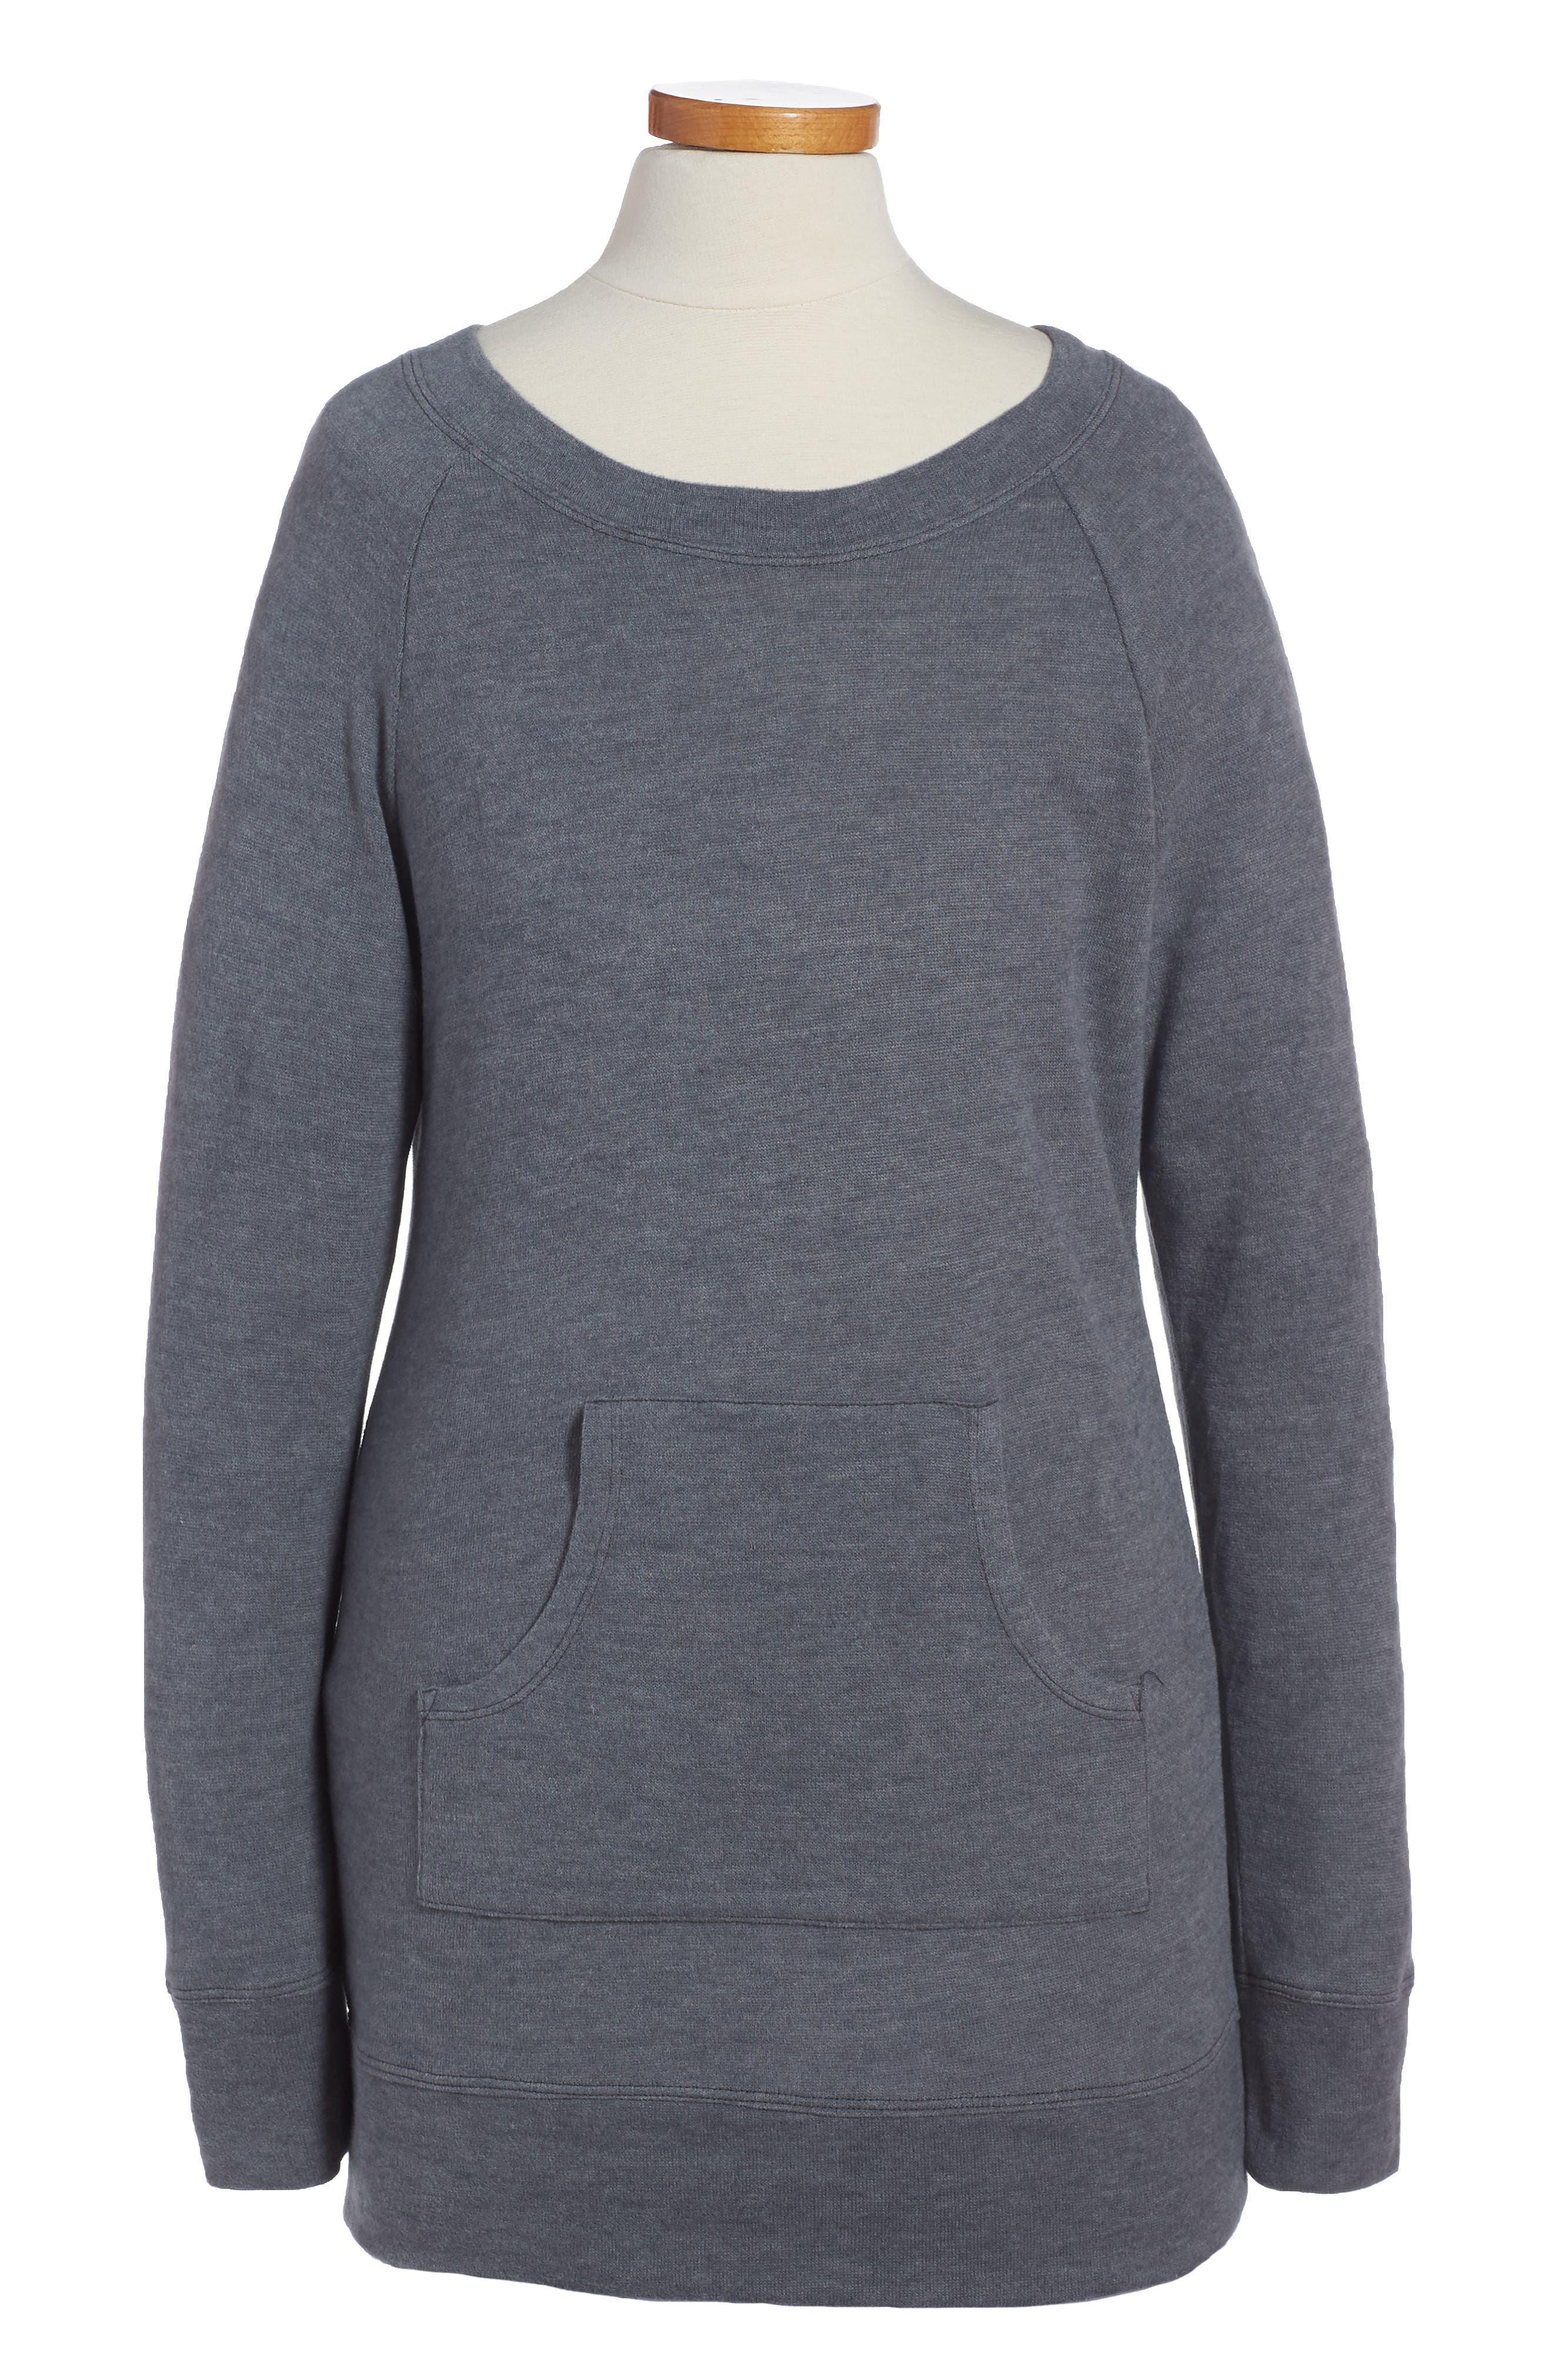 Sweatshirt Dress,                             Main thumbnail 1, color,                             Grey